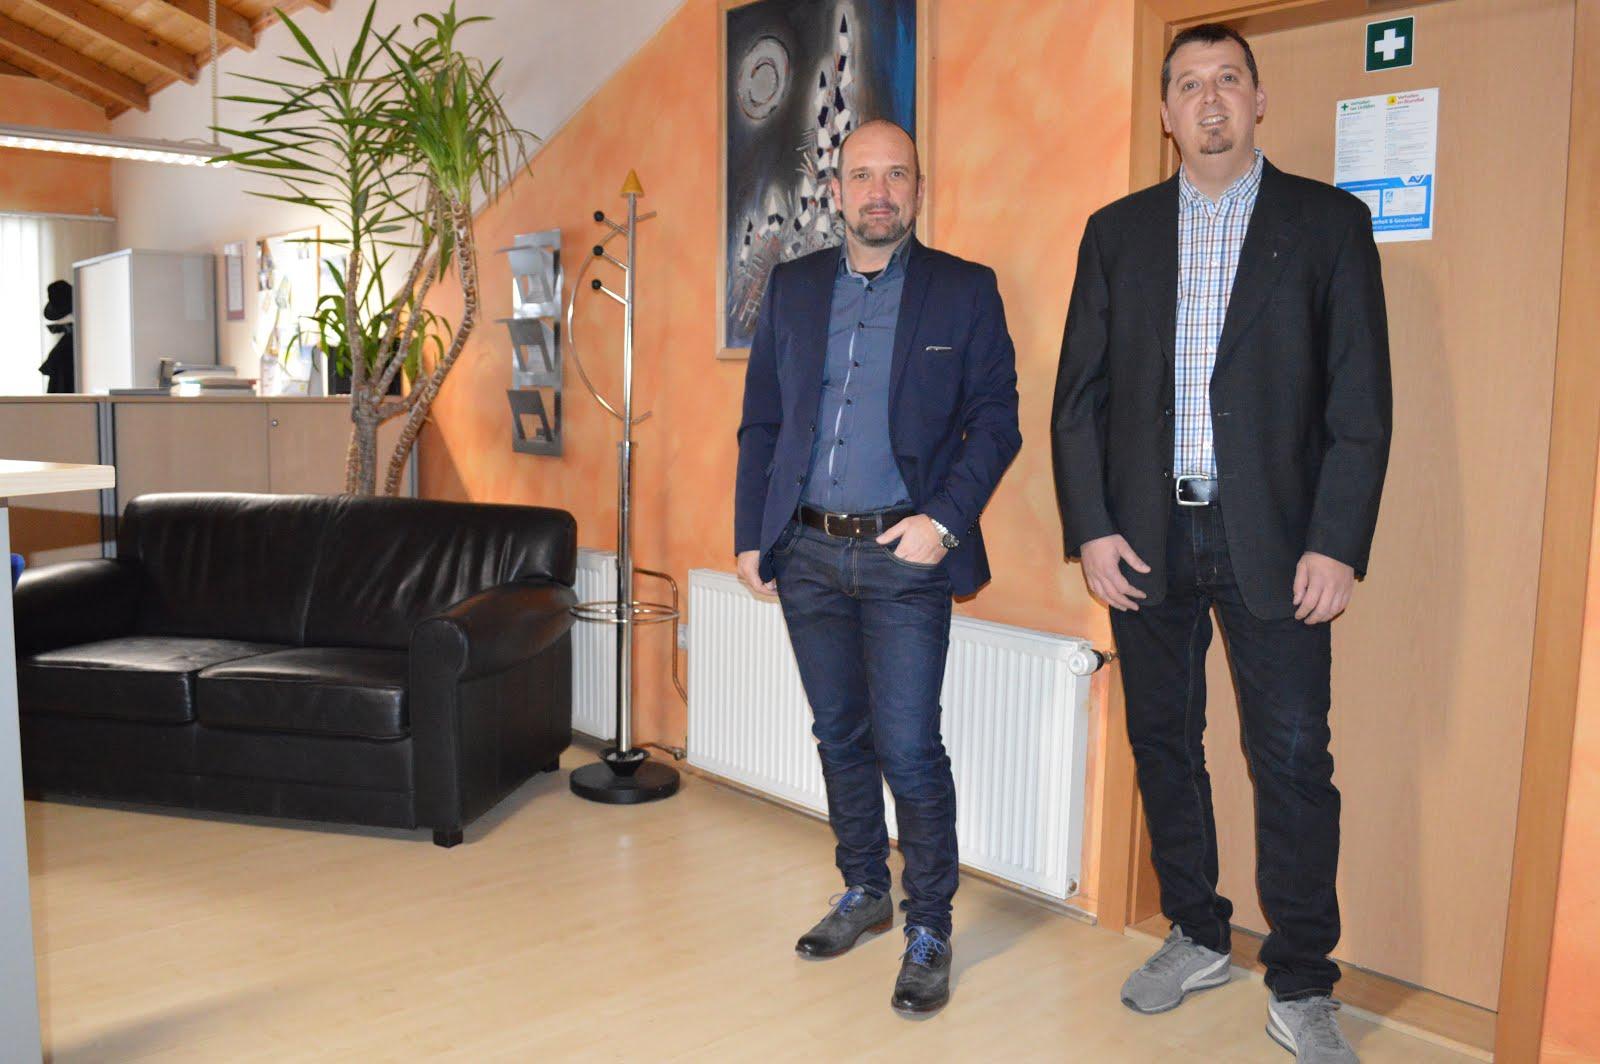 KPI GmbH, GF Heinz Martinz und PD Manuel Rogl